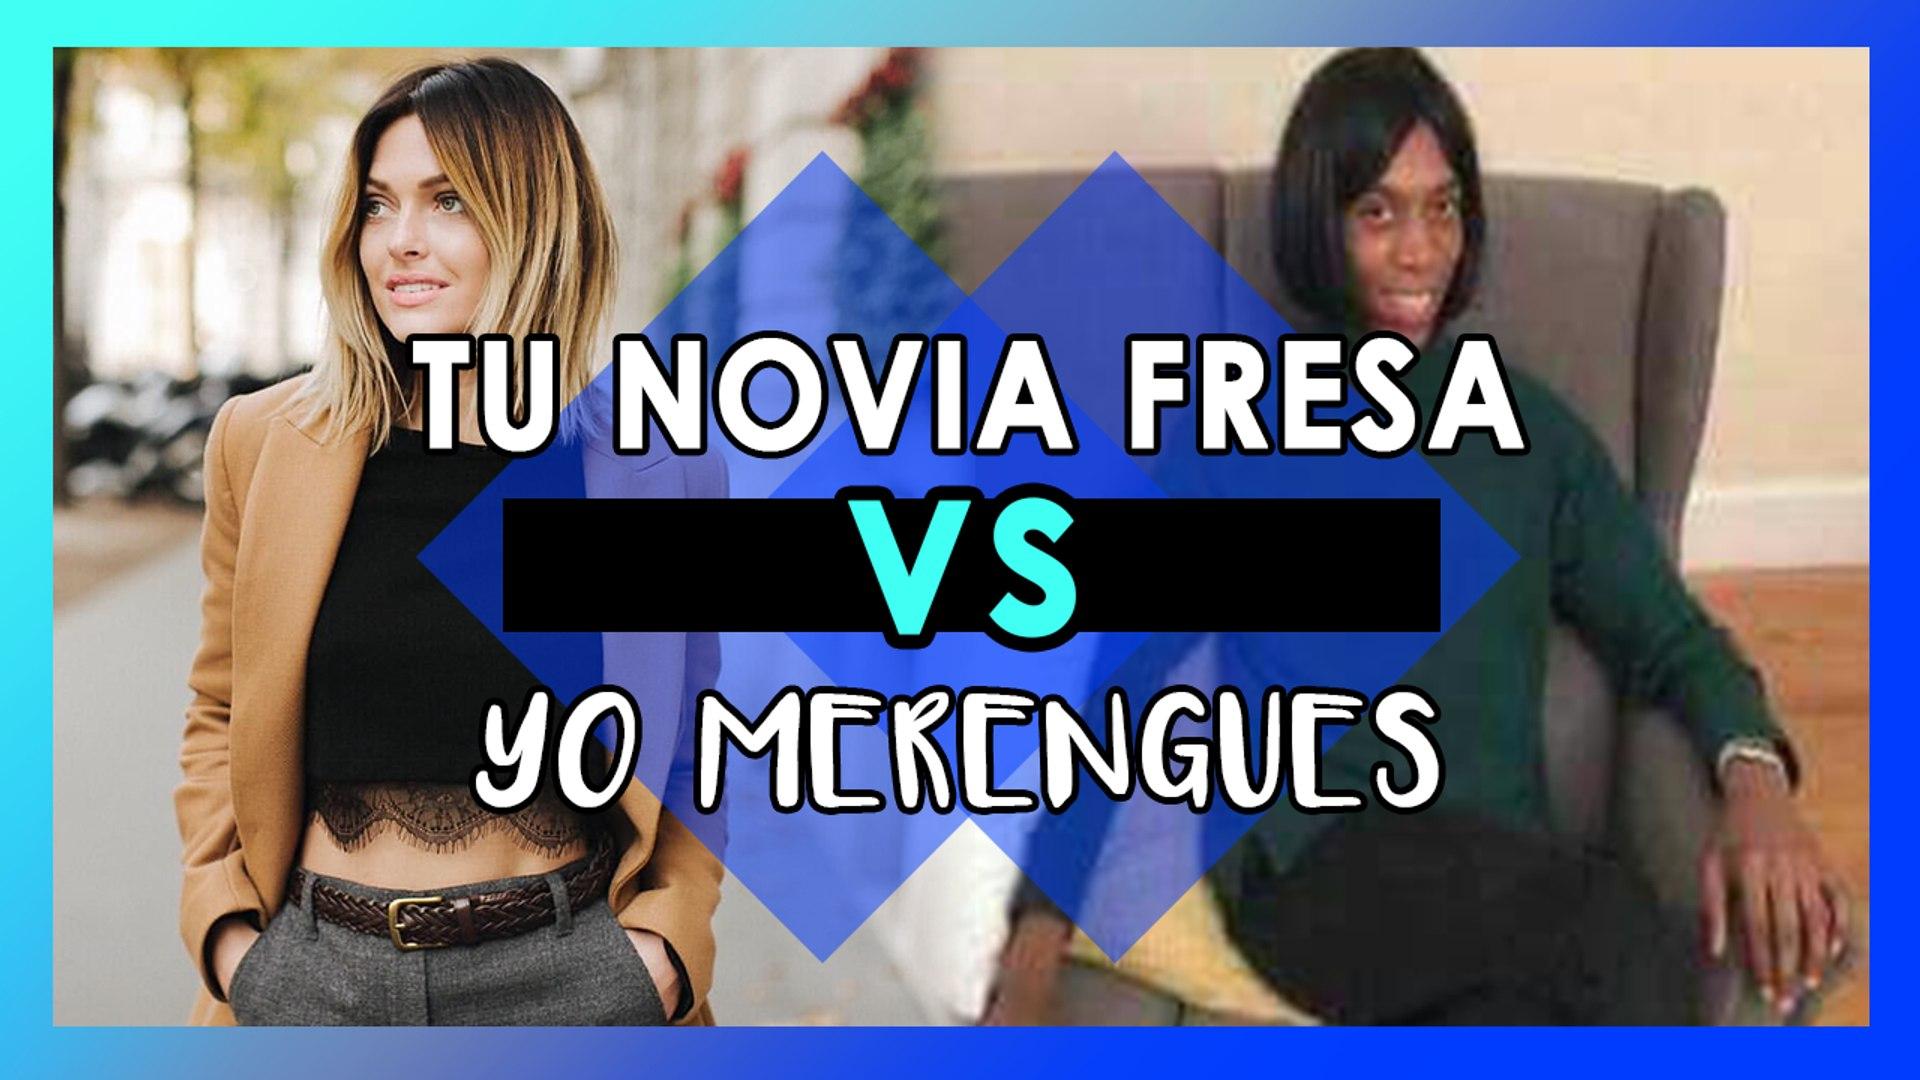 Novia fresa vs. Yo merengues ;) - Vídeo Dailymotion